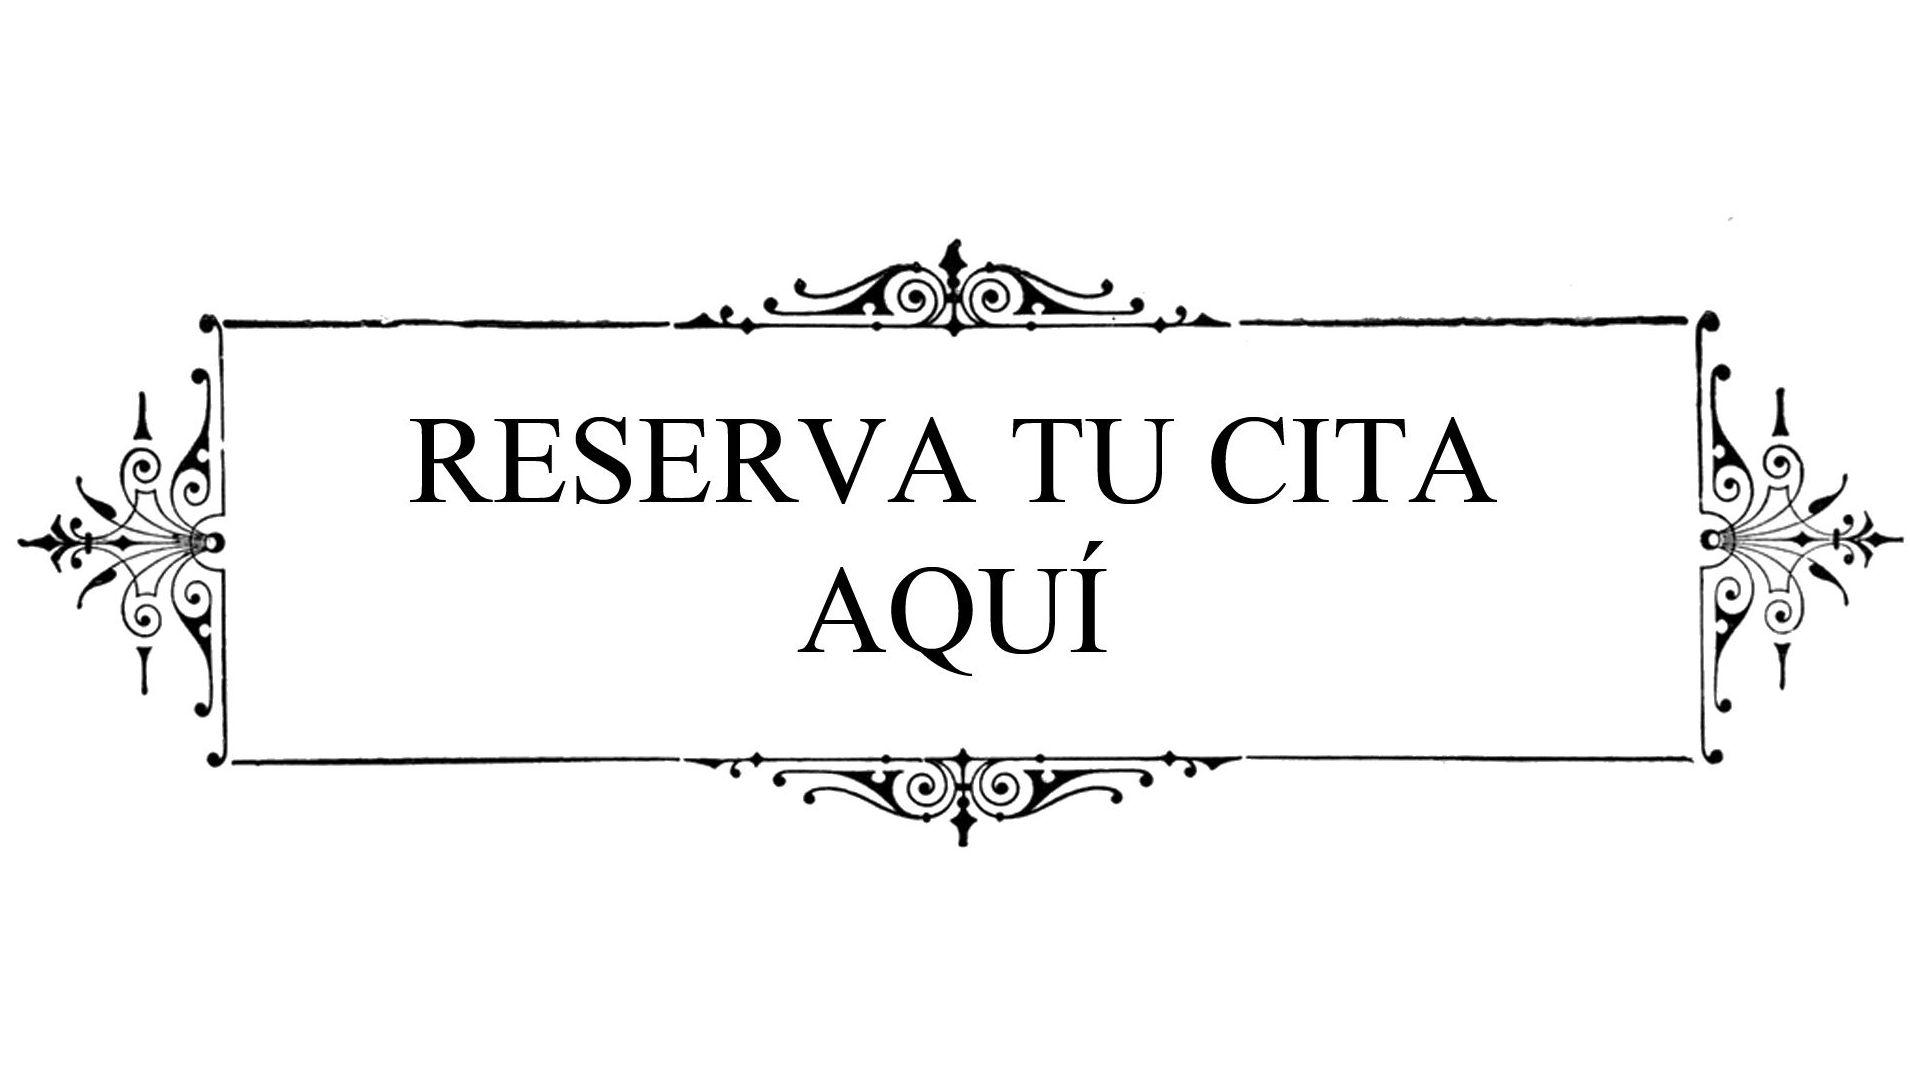 Reserva Online: Catálogo de Barbería GyC